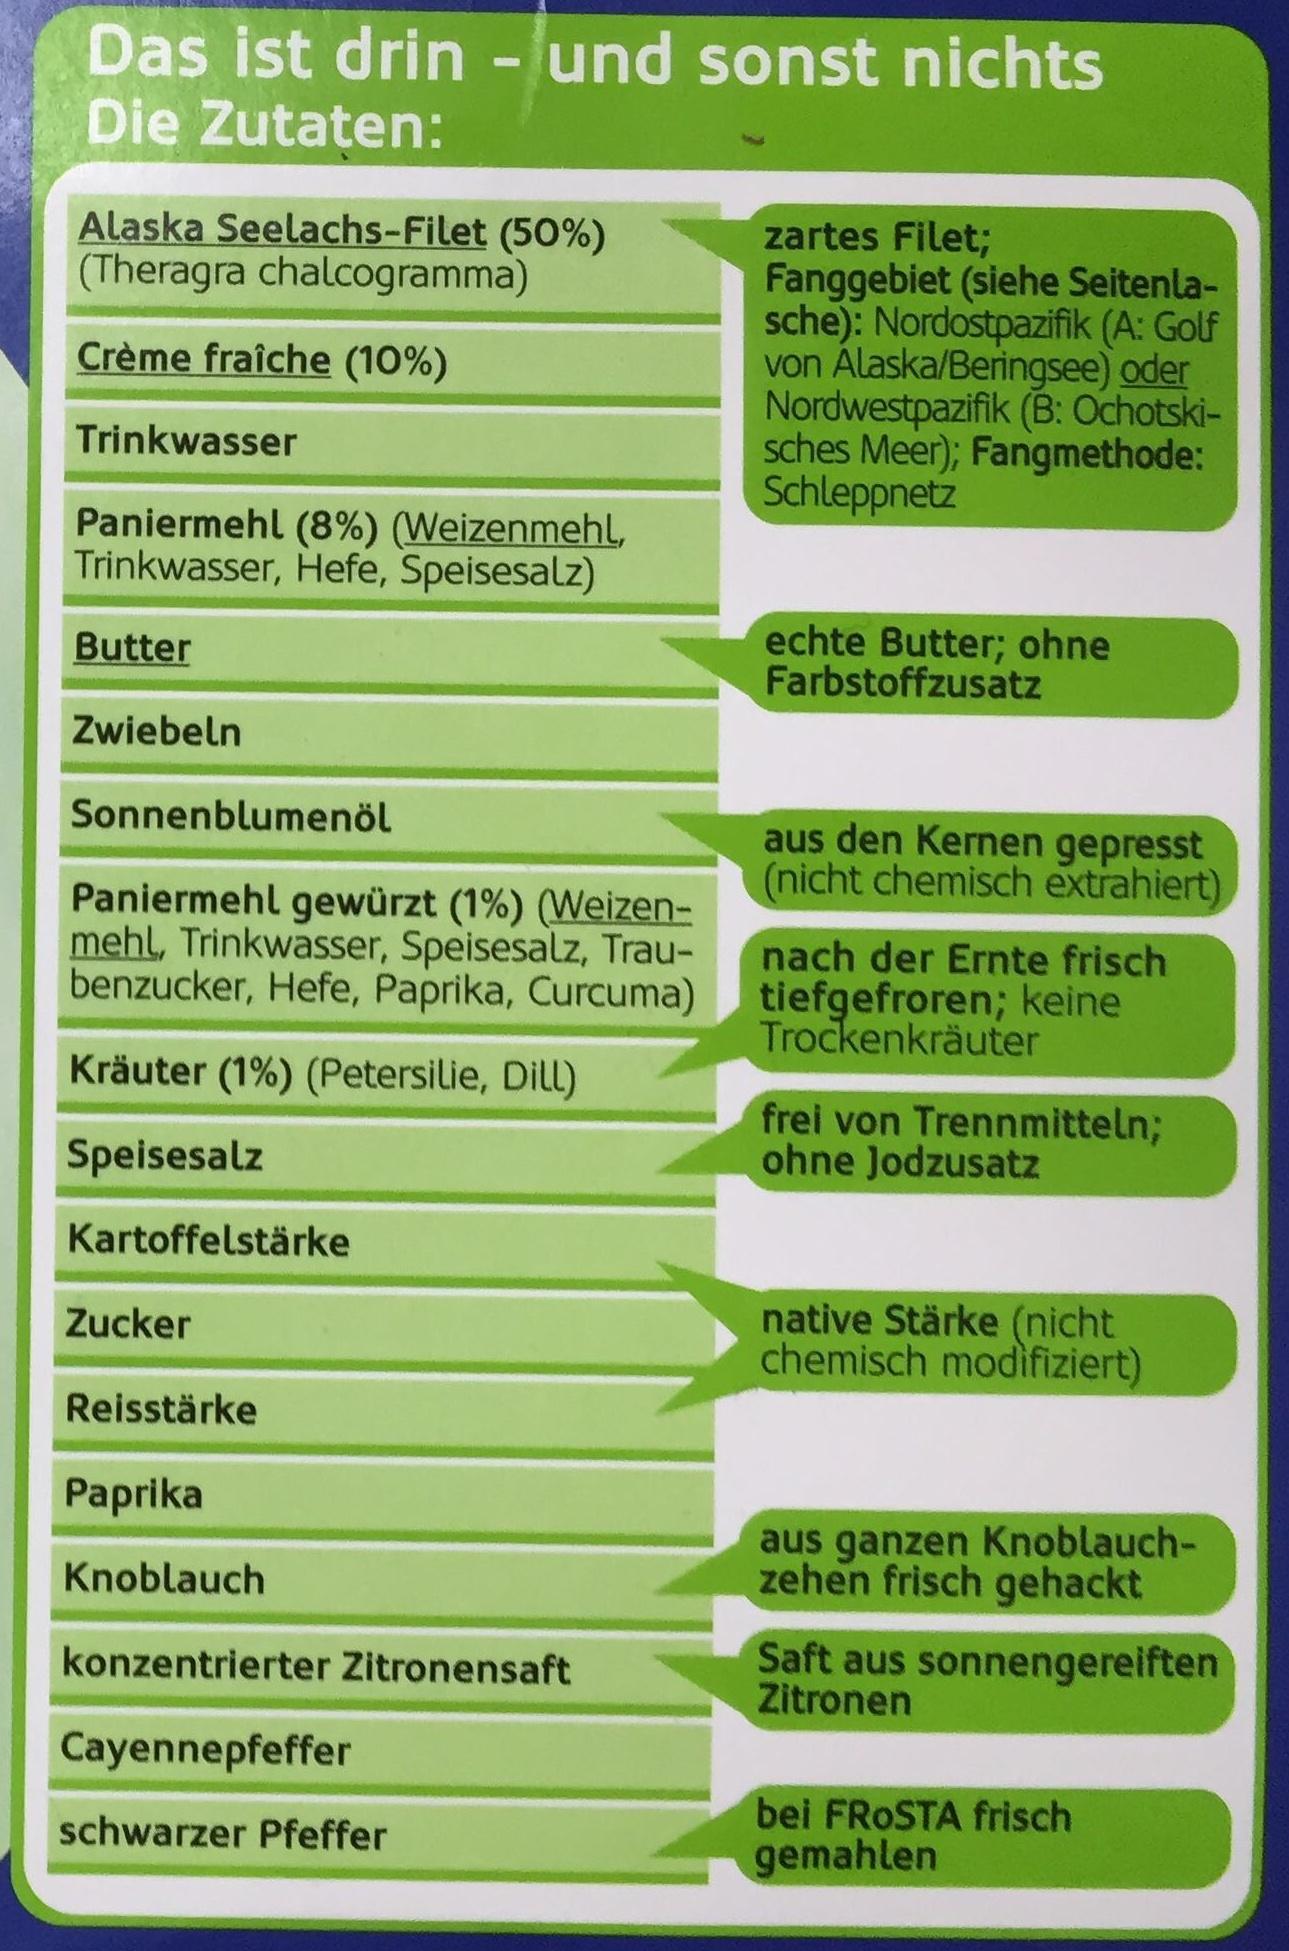 Schlemmerfilet Bordelaise Kräuter-Crème fraîche - Ingredients